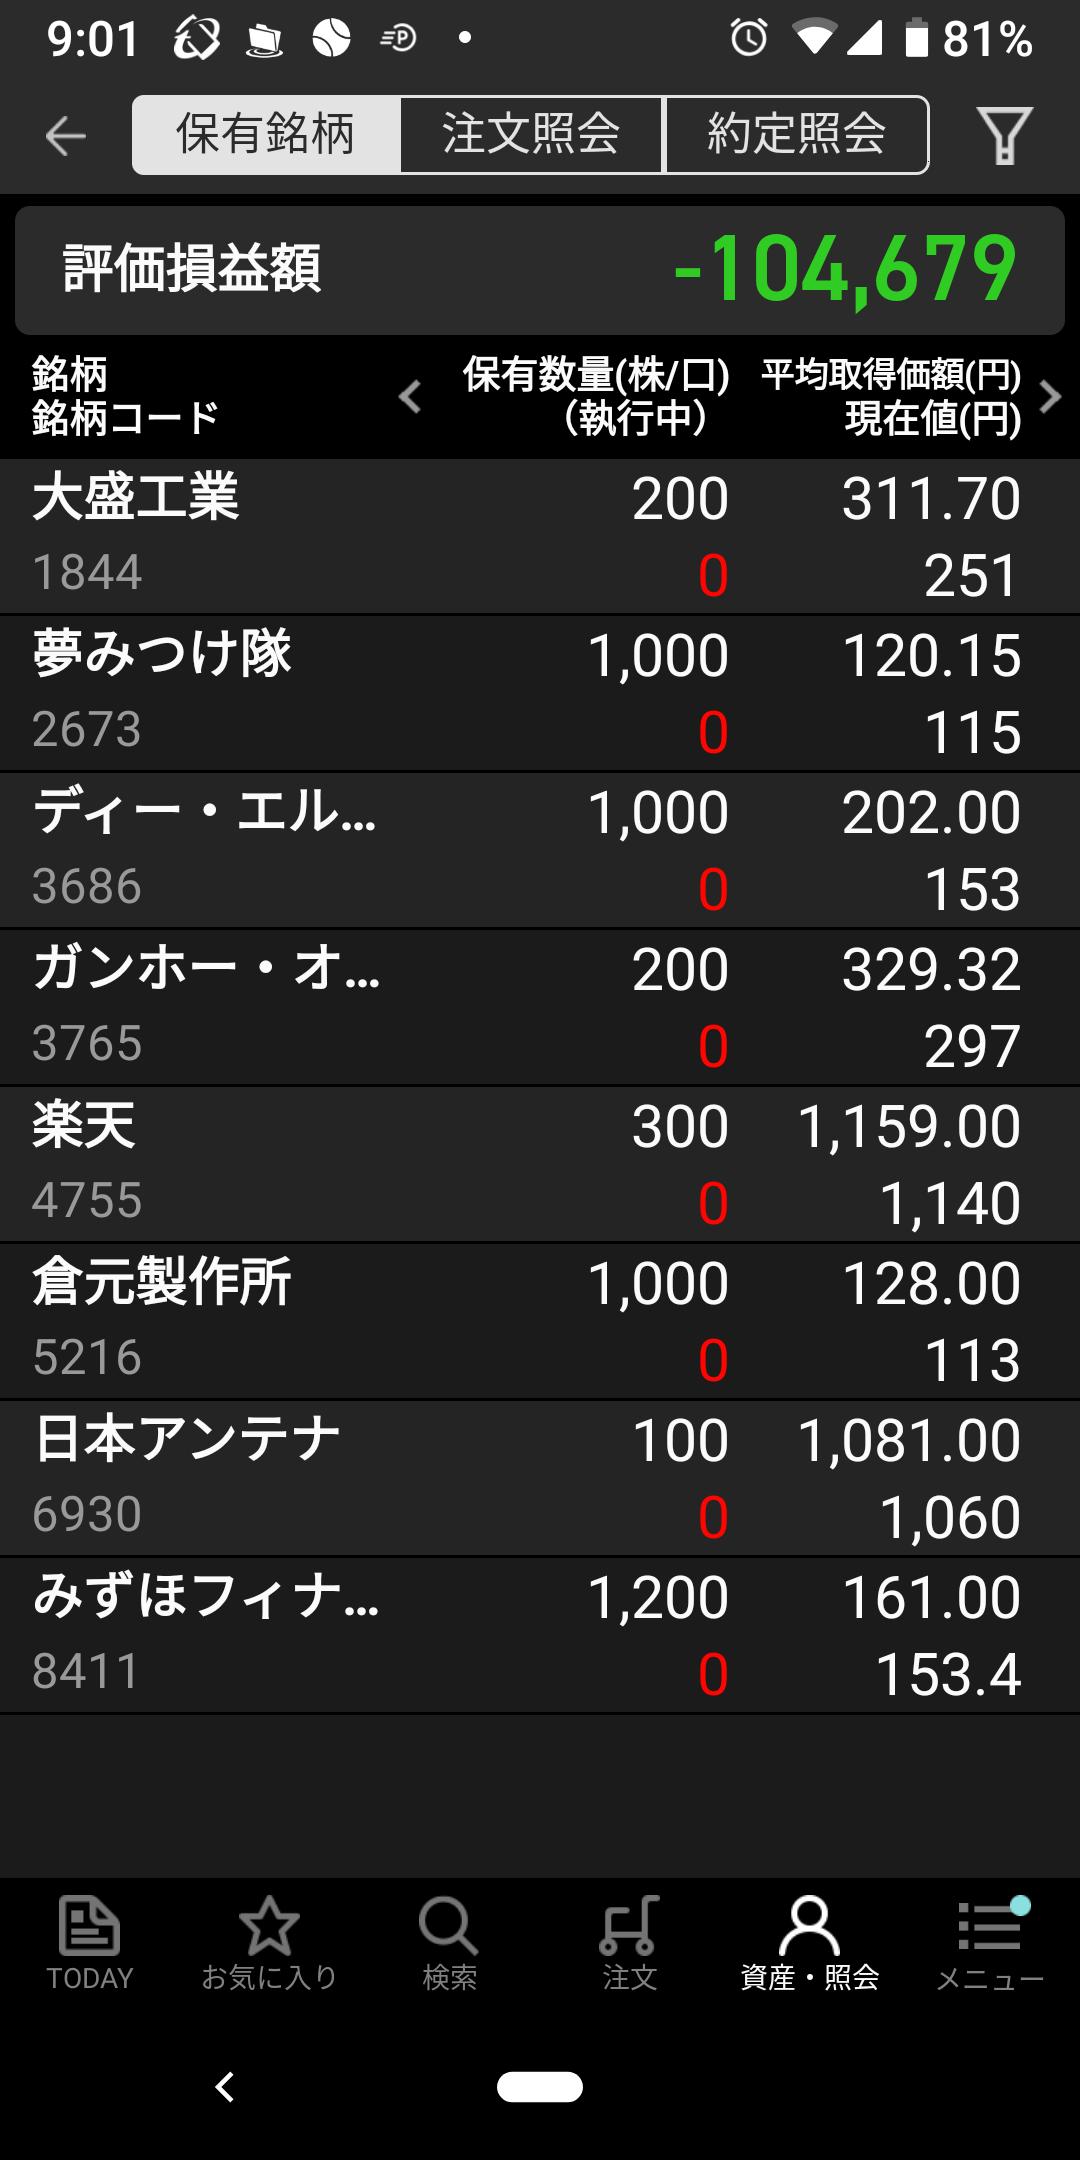 Screenshot (2019_06_07 9_01_10)